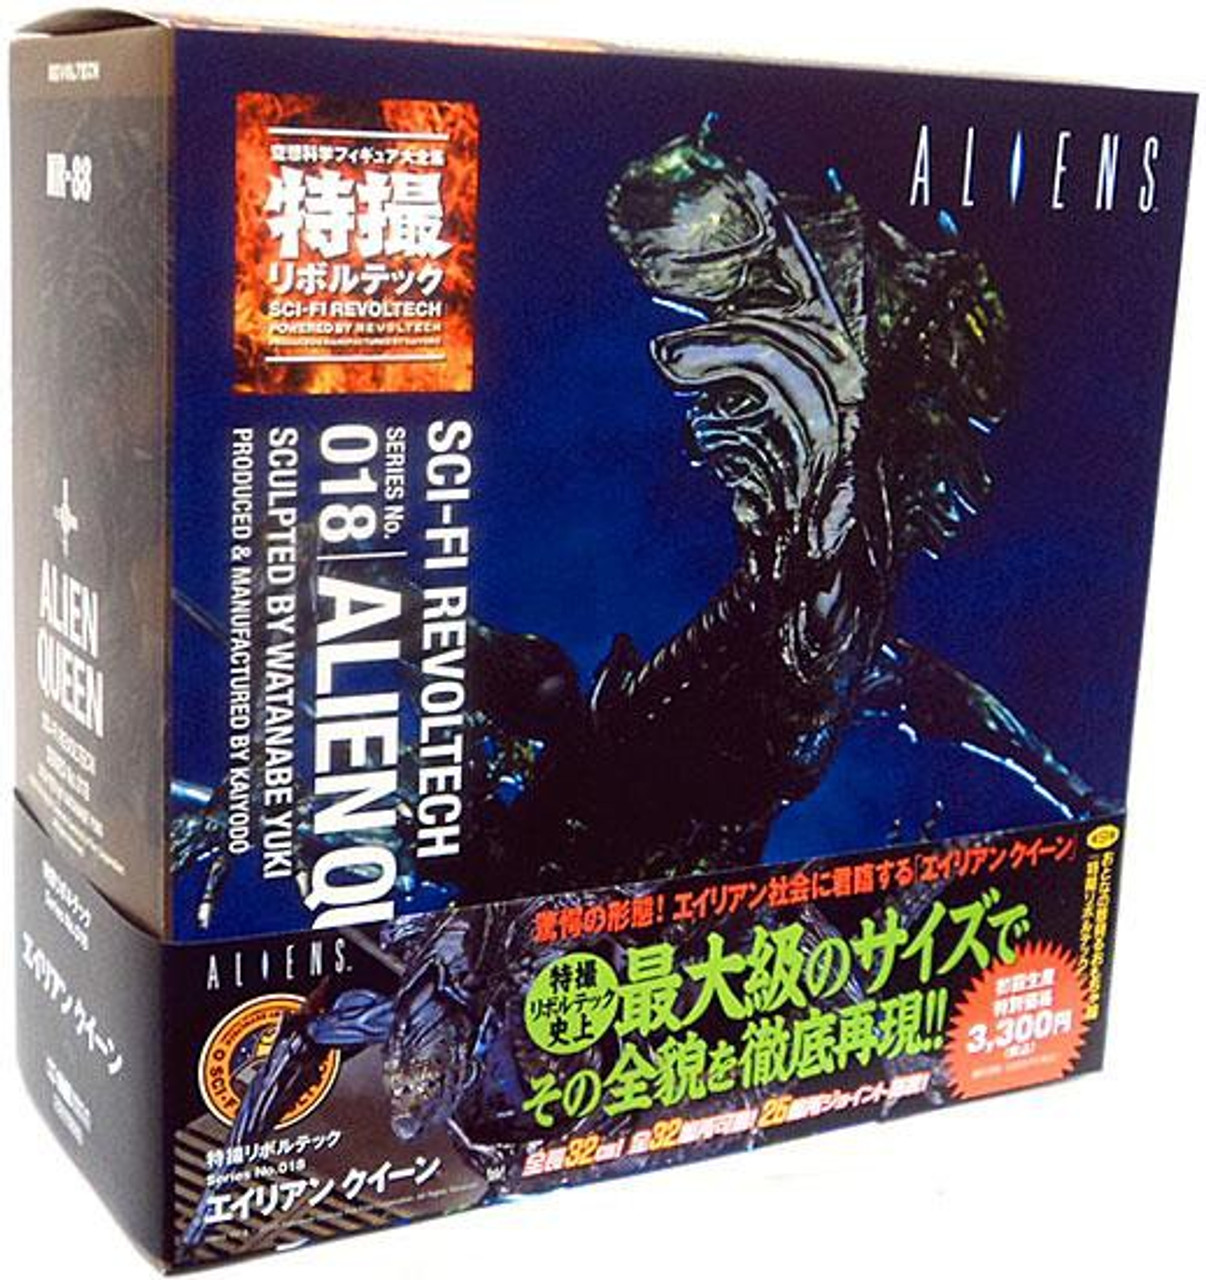 Aliens Sci-Fi Revoltech Alien Queen Action Figure #018